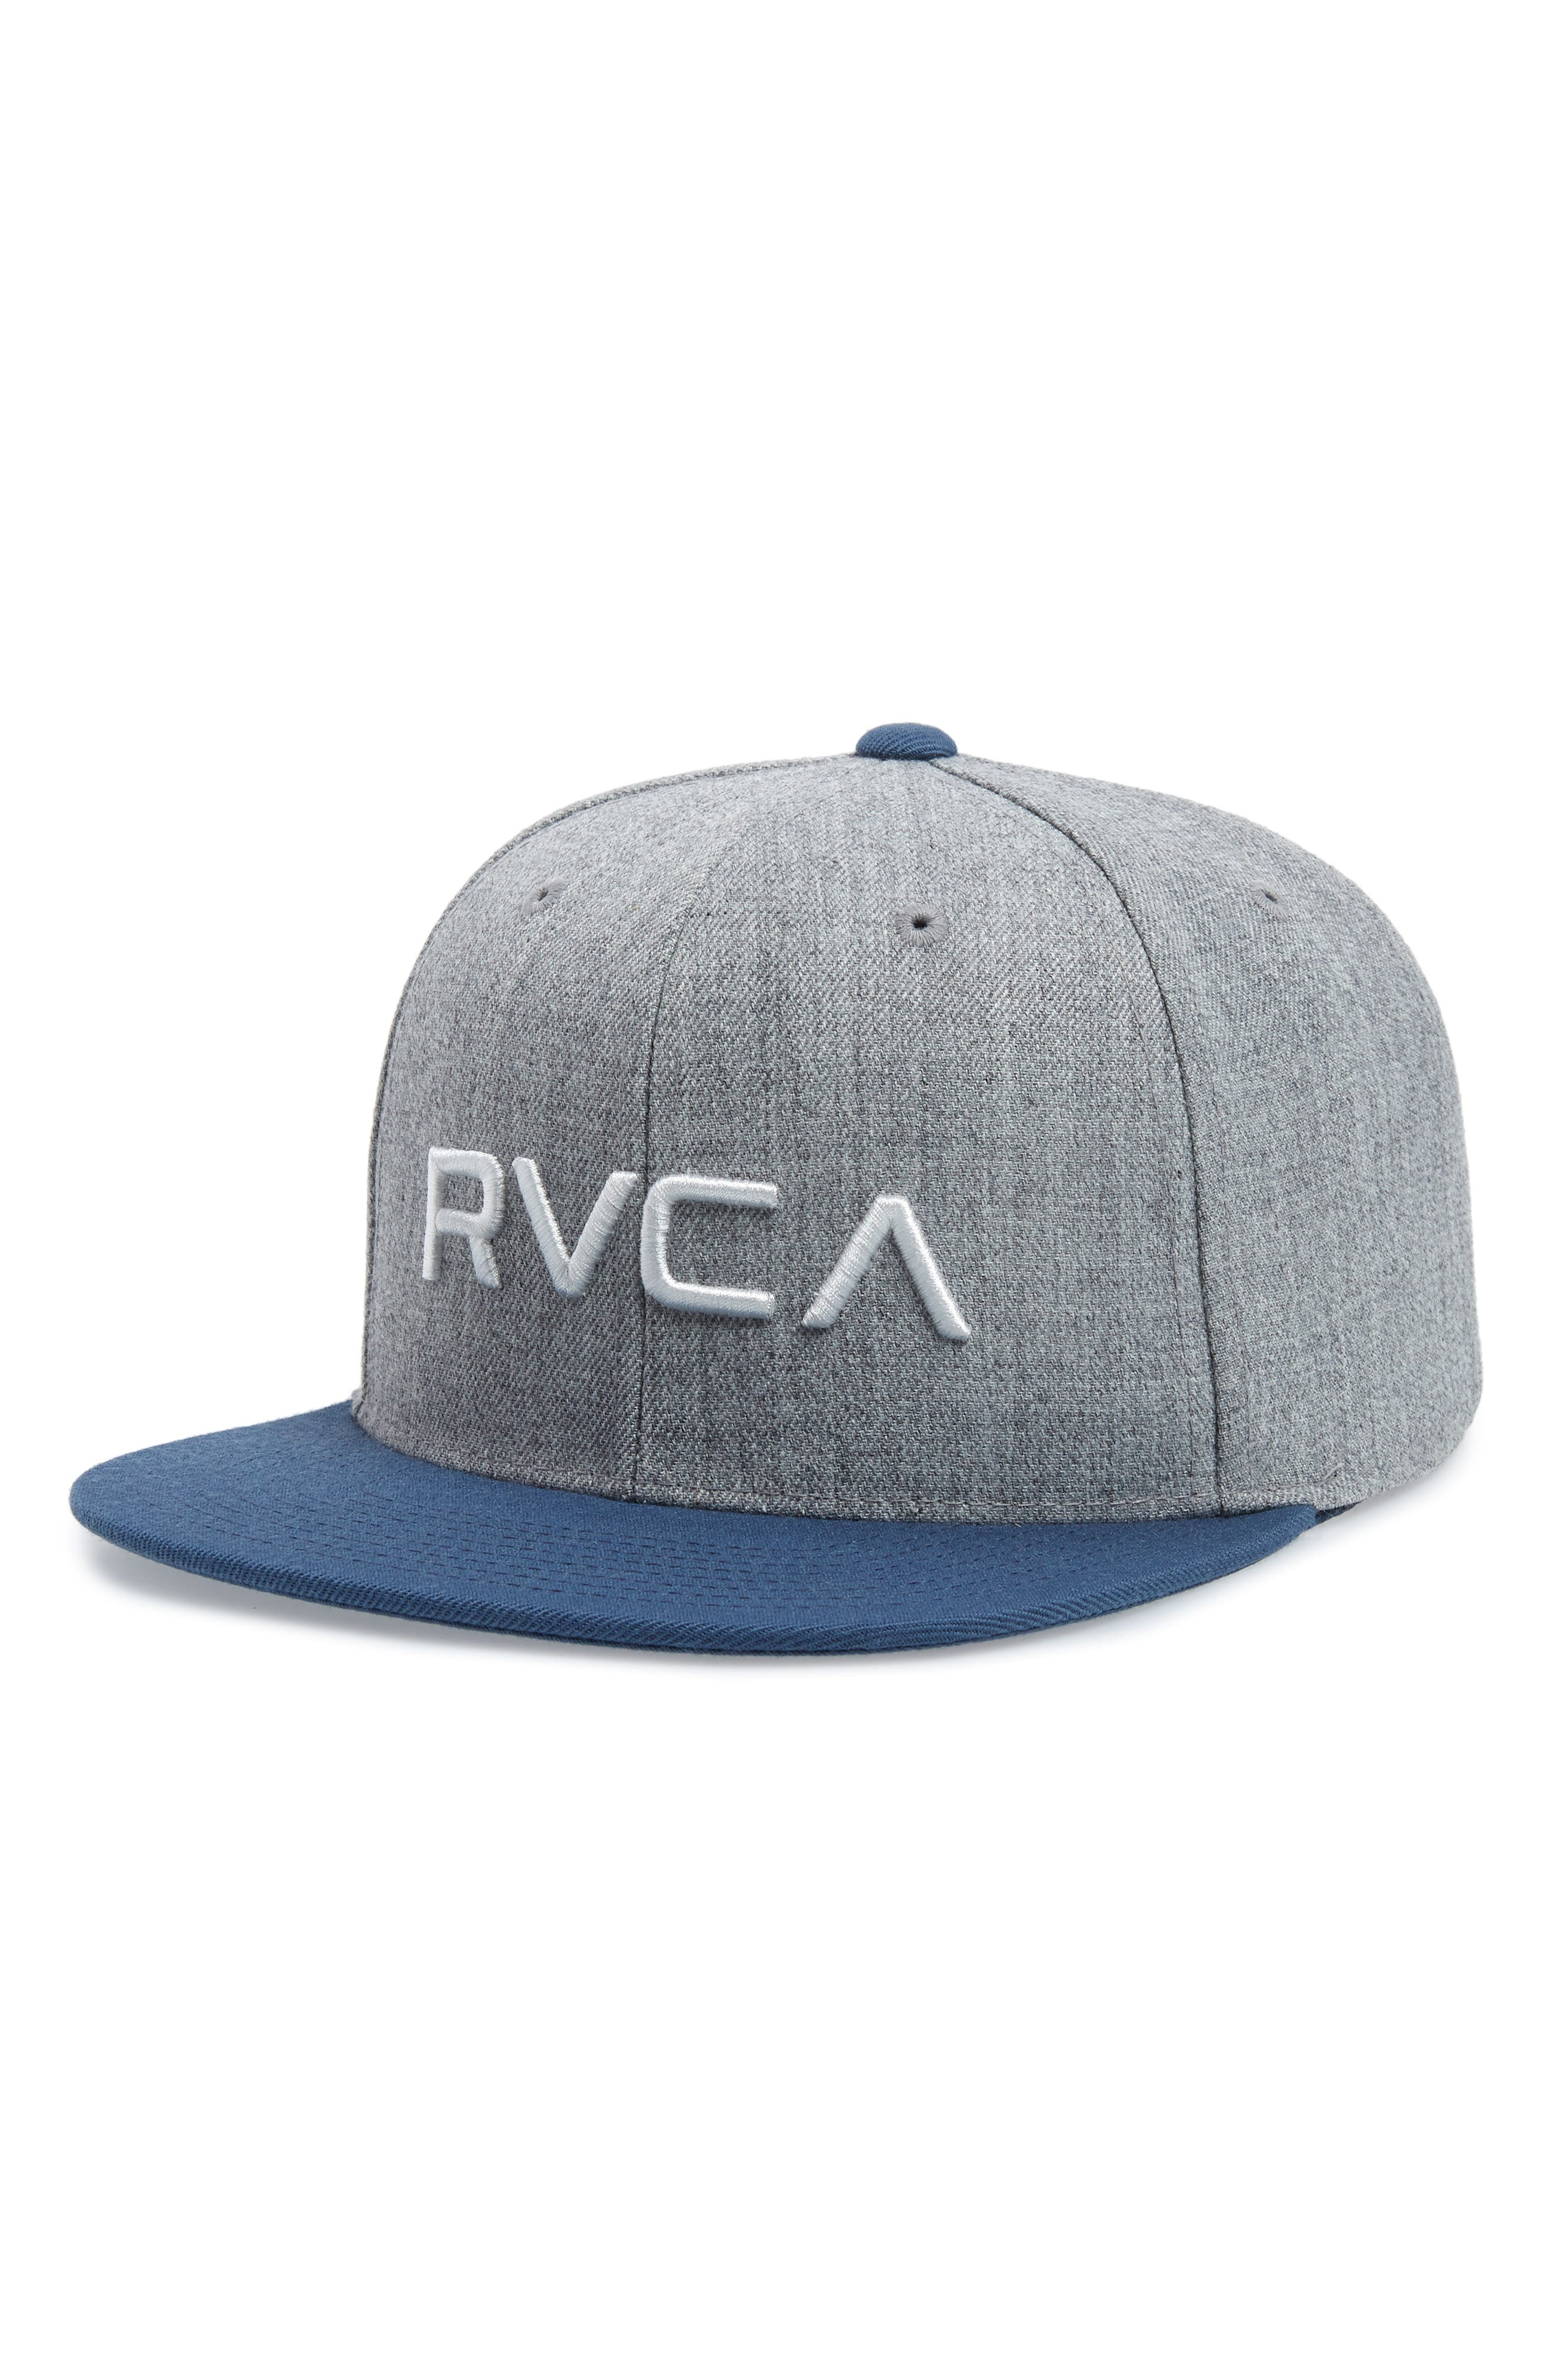 RVCA Twill Snapback Baseball Cap, Main, color, GREY BLUE